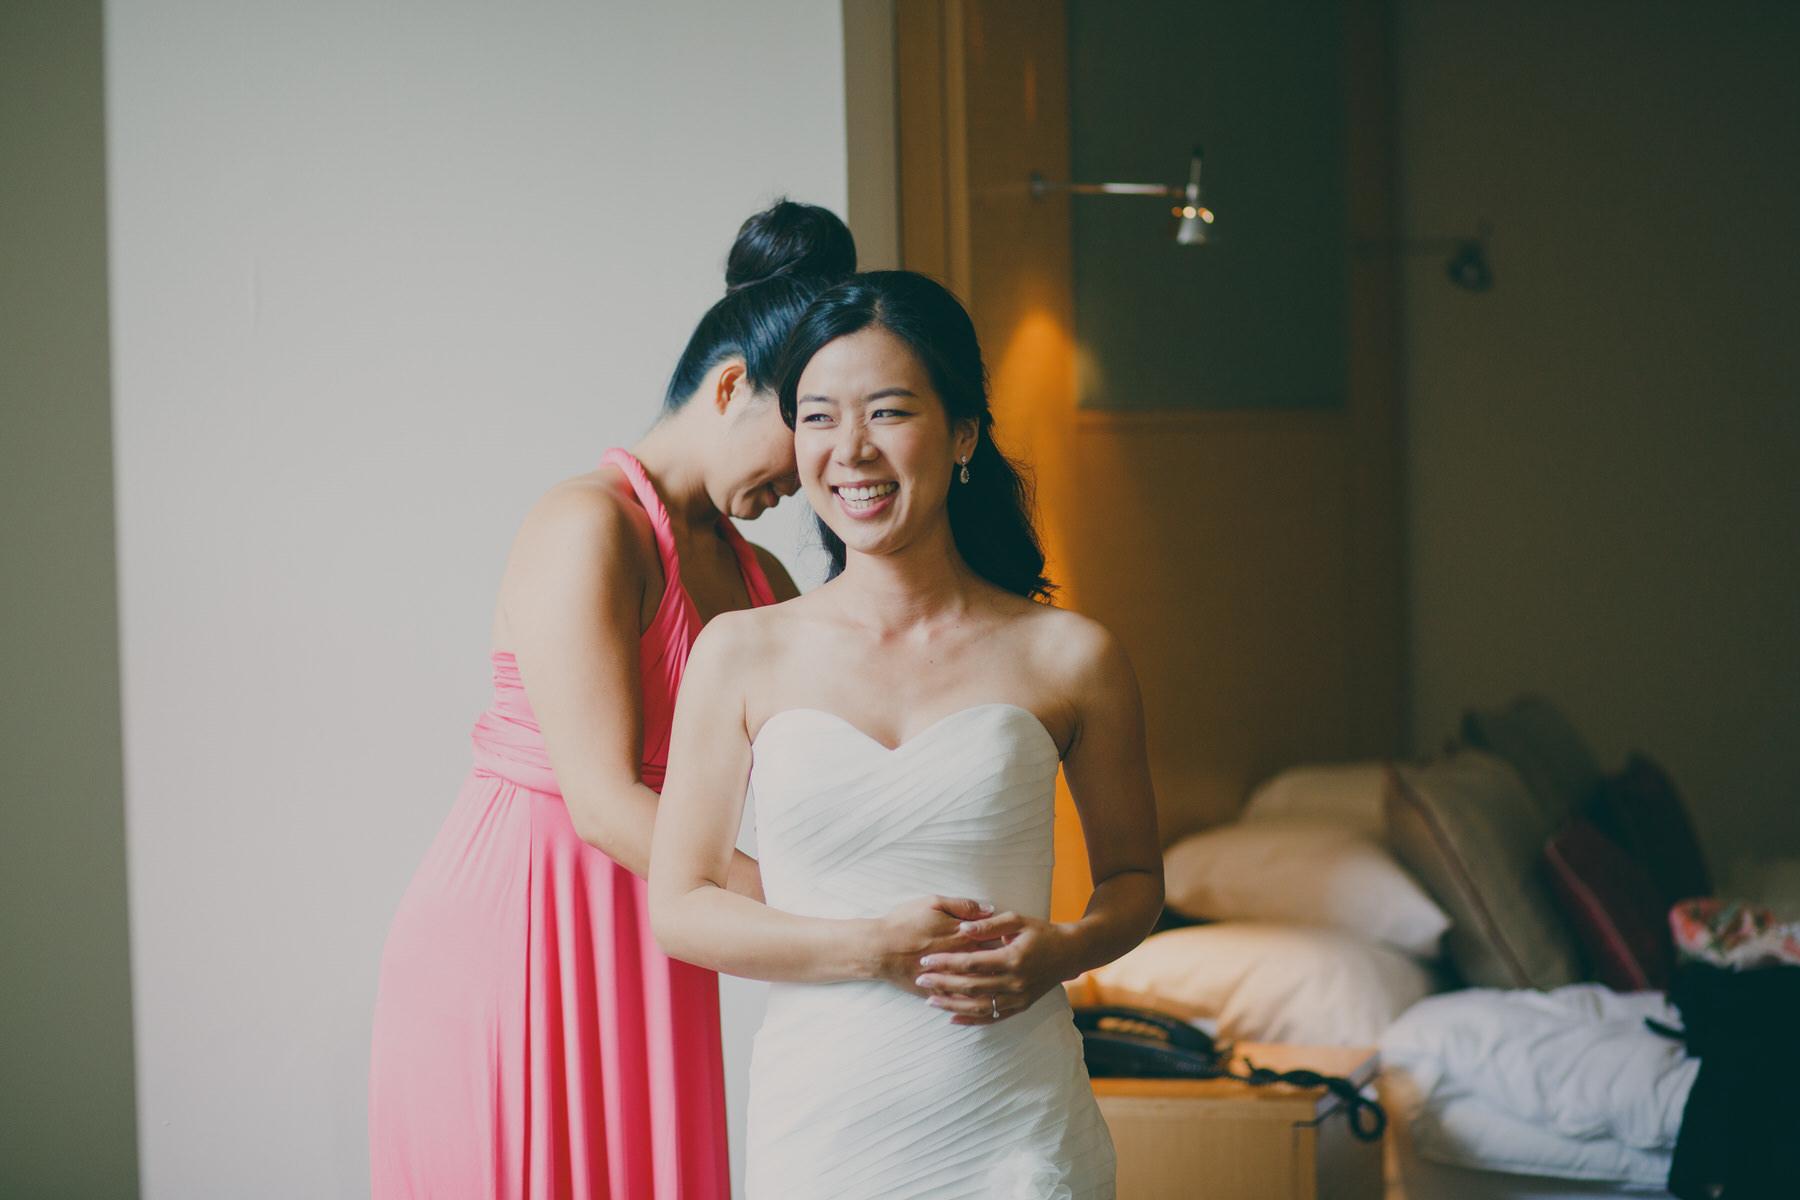 60 lovely moment bridesmaid zipping bride's dress.jpg